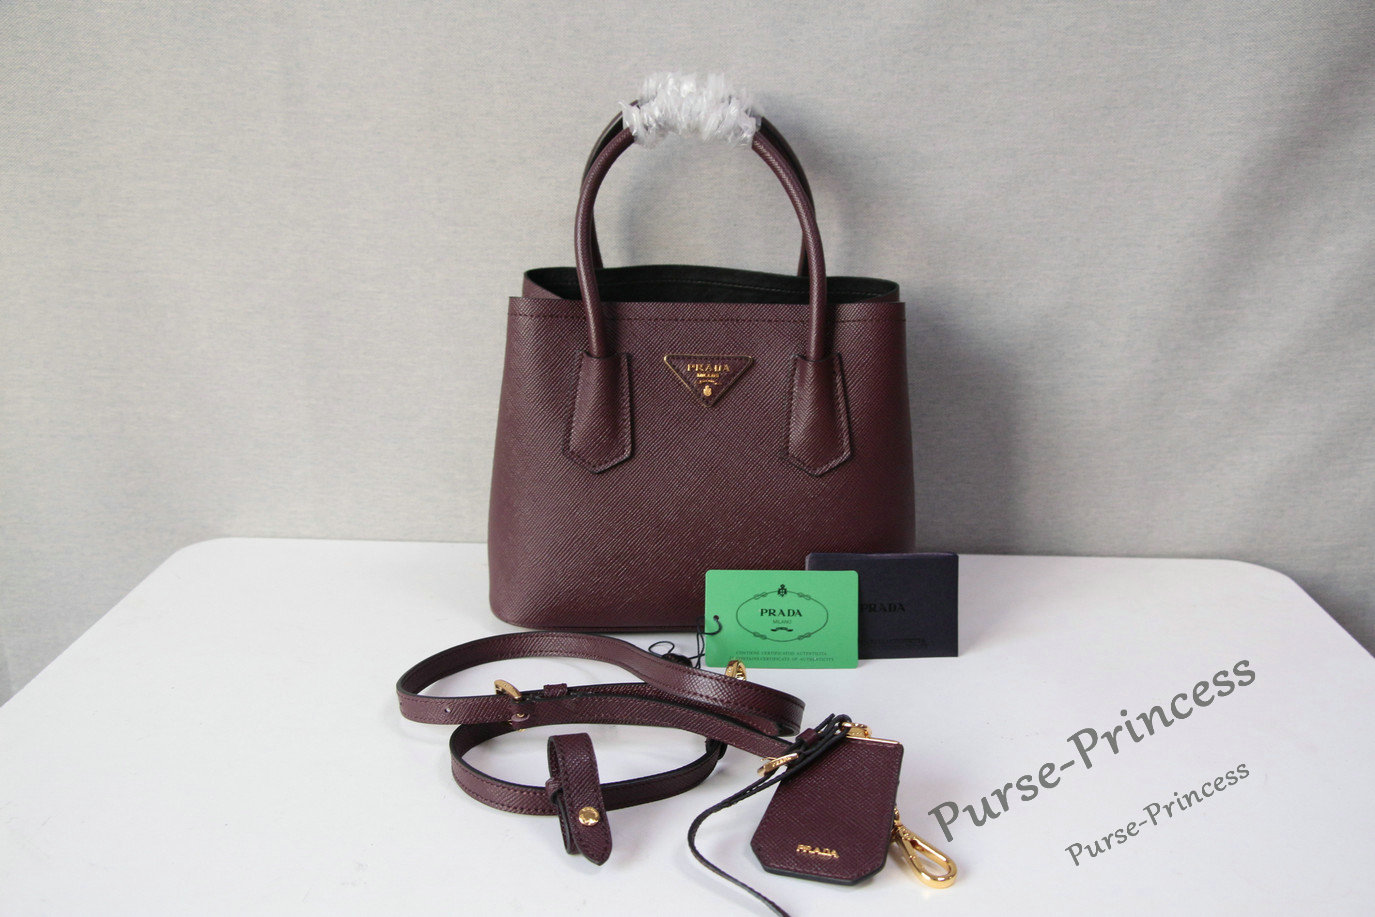 prada leather bag with removable shoulder strap